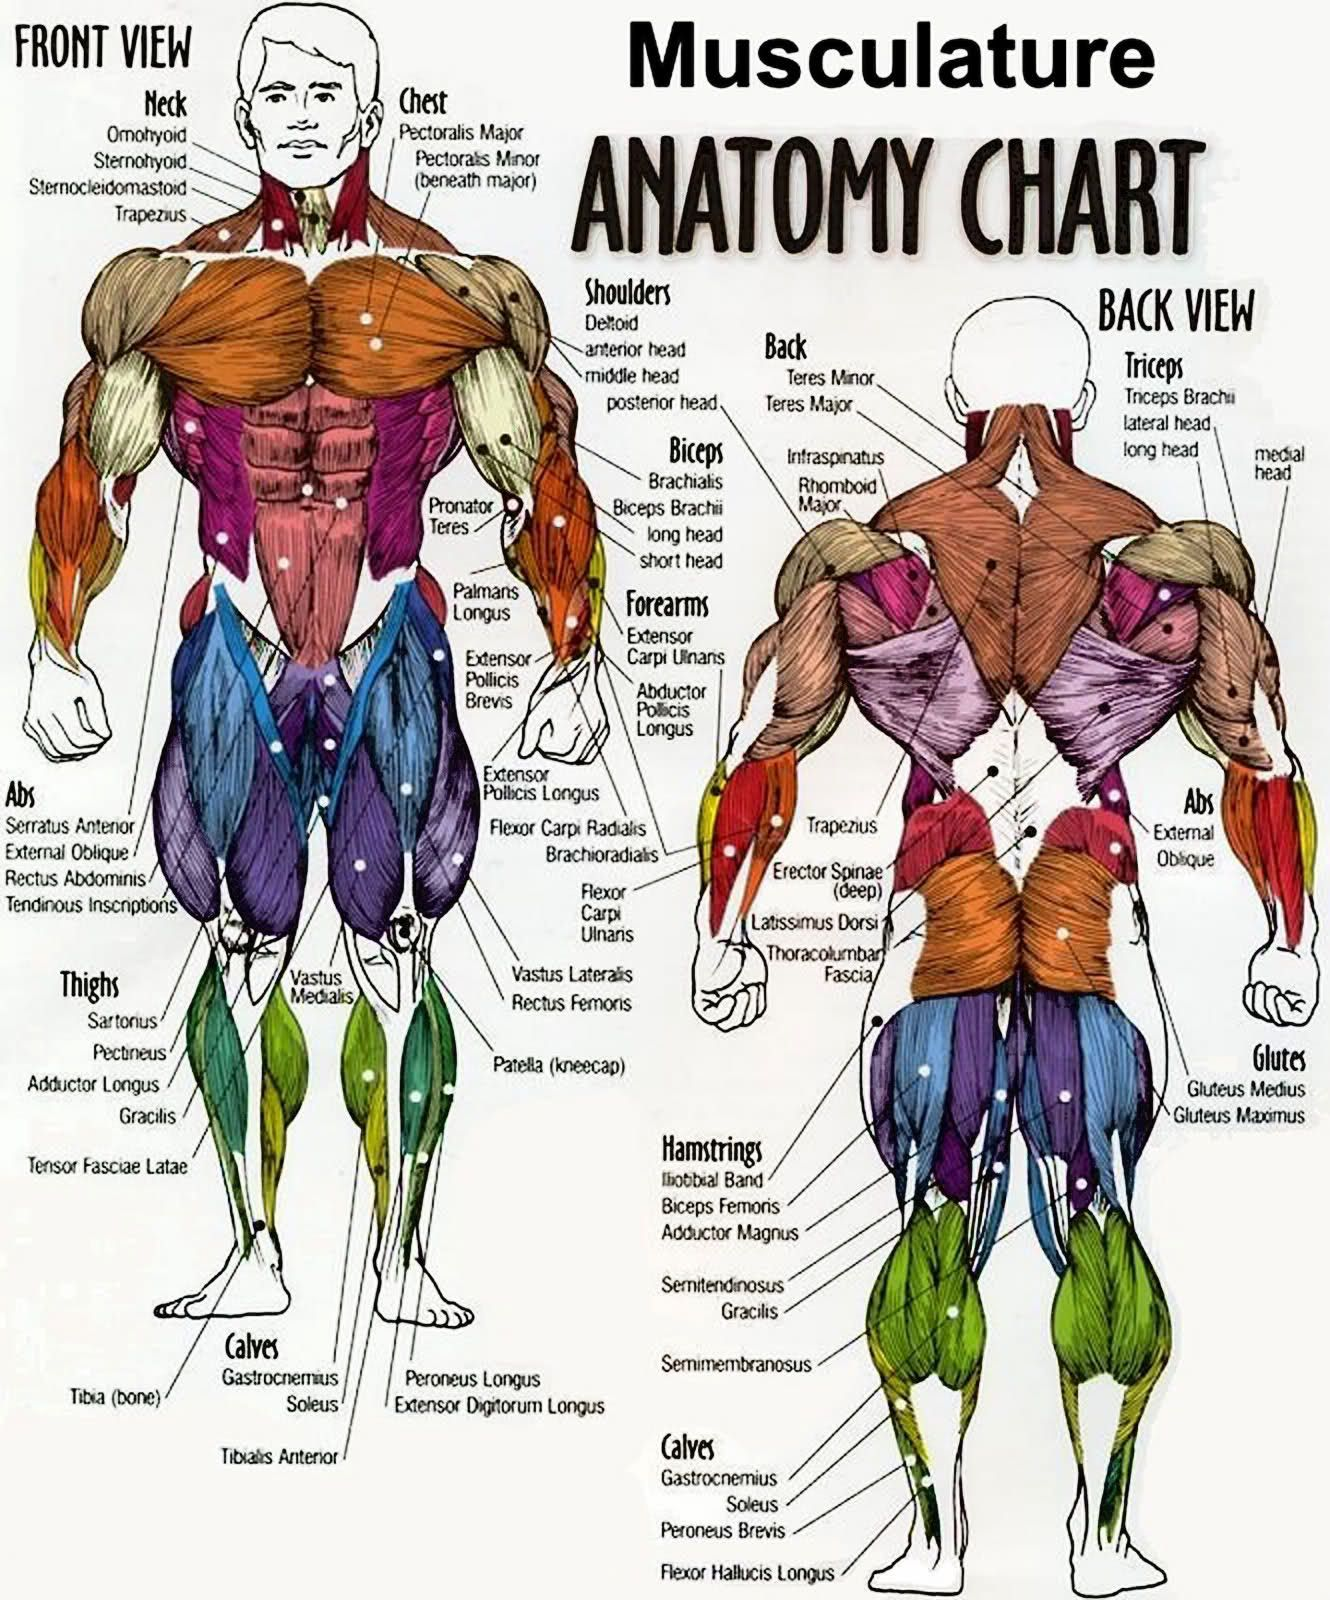 Pin By Saaqib Jilani On Science And Weight Loss Anatomia Anatomia